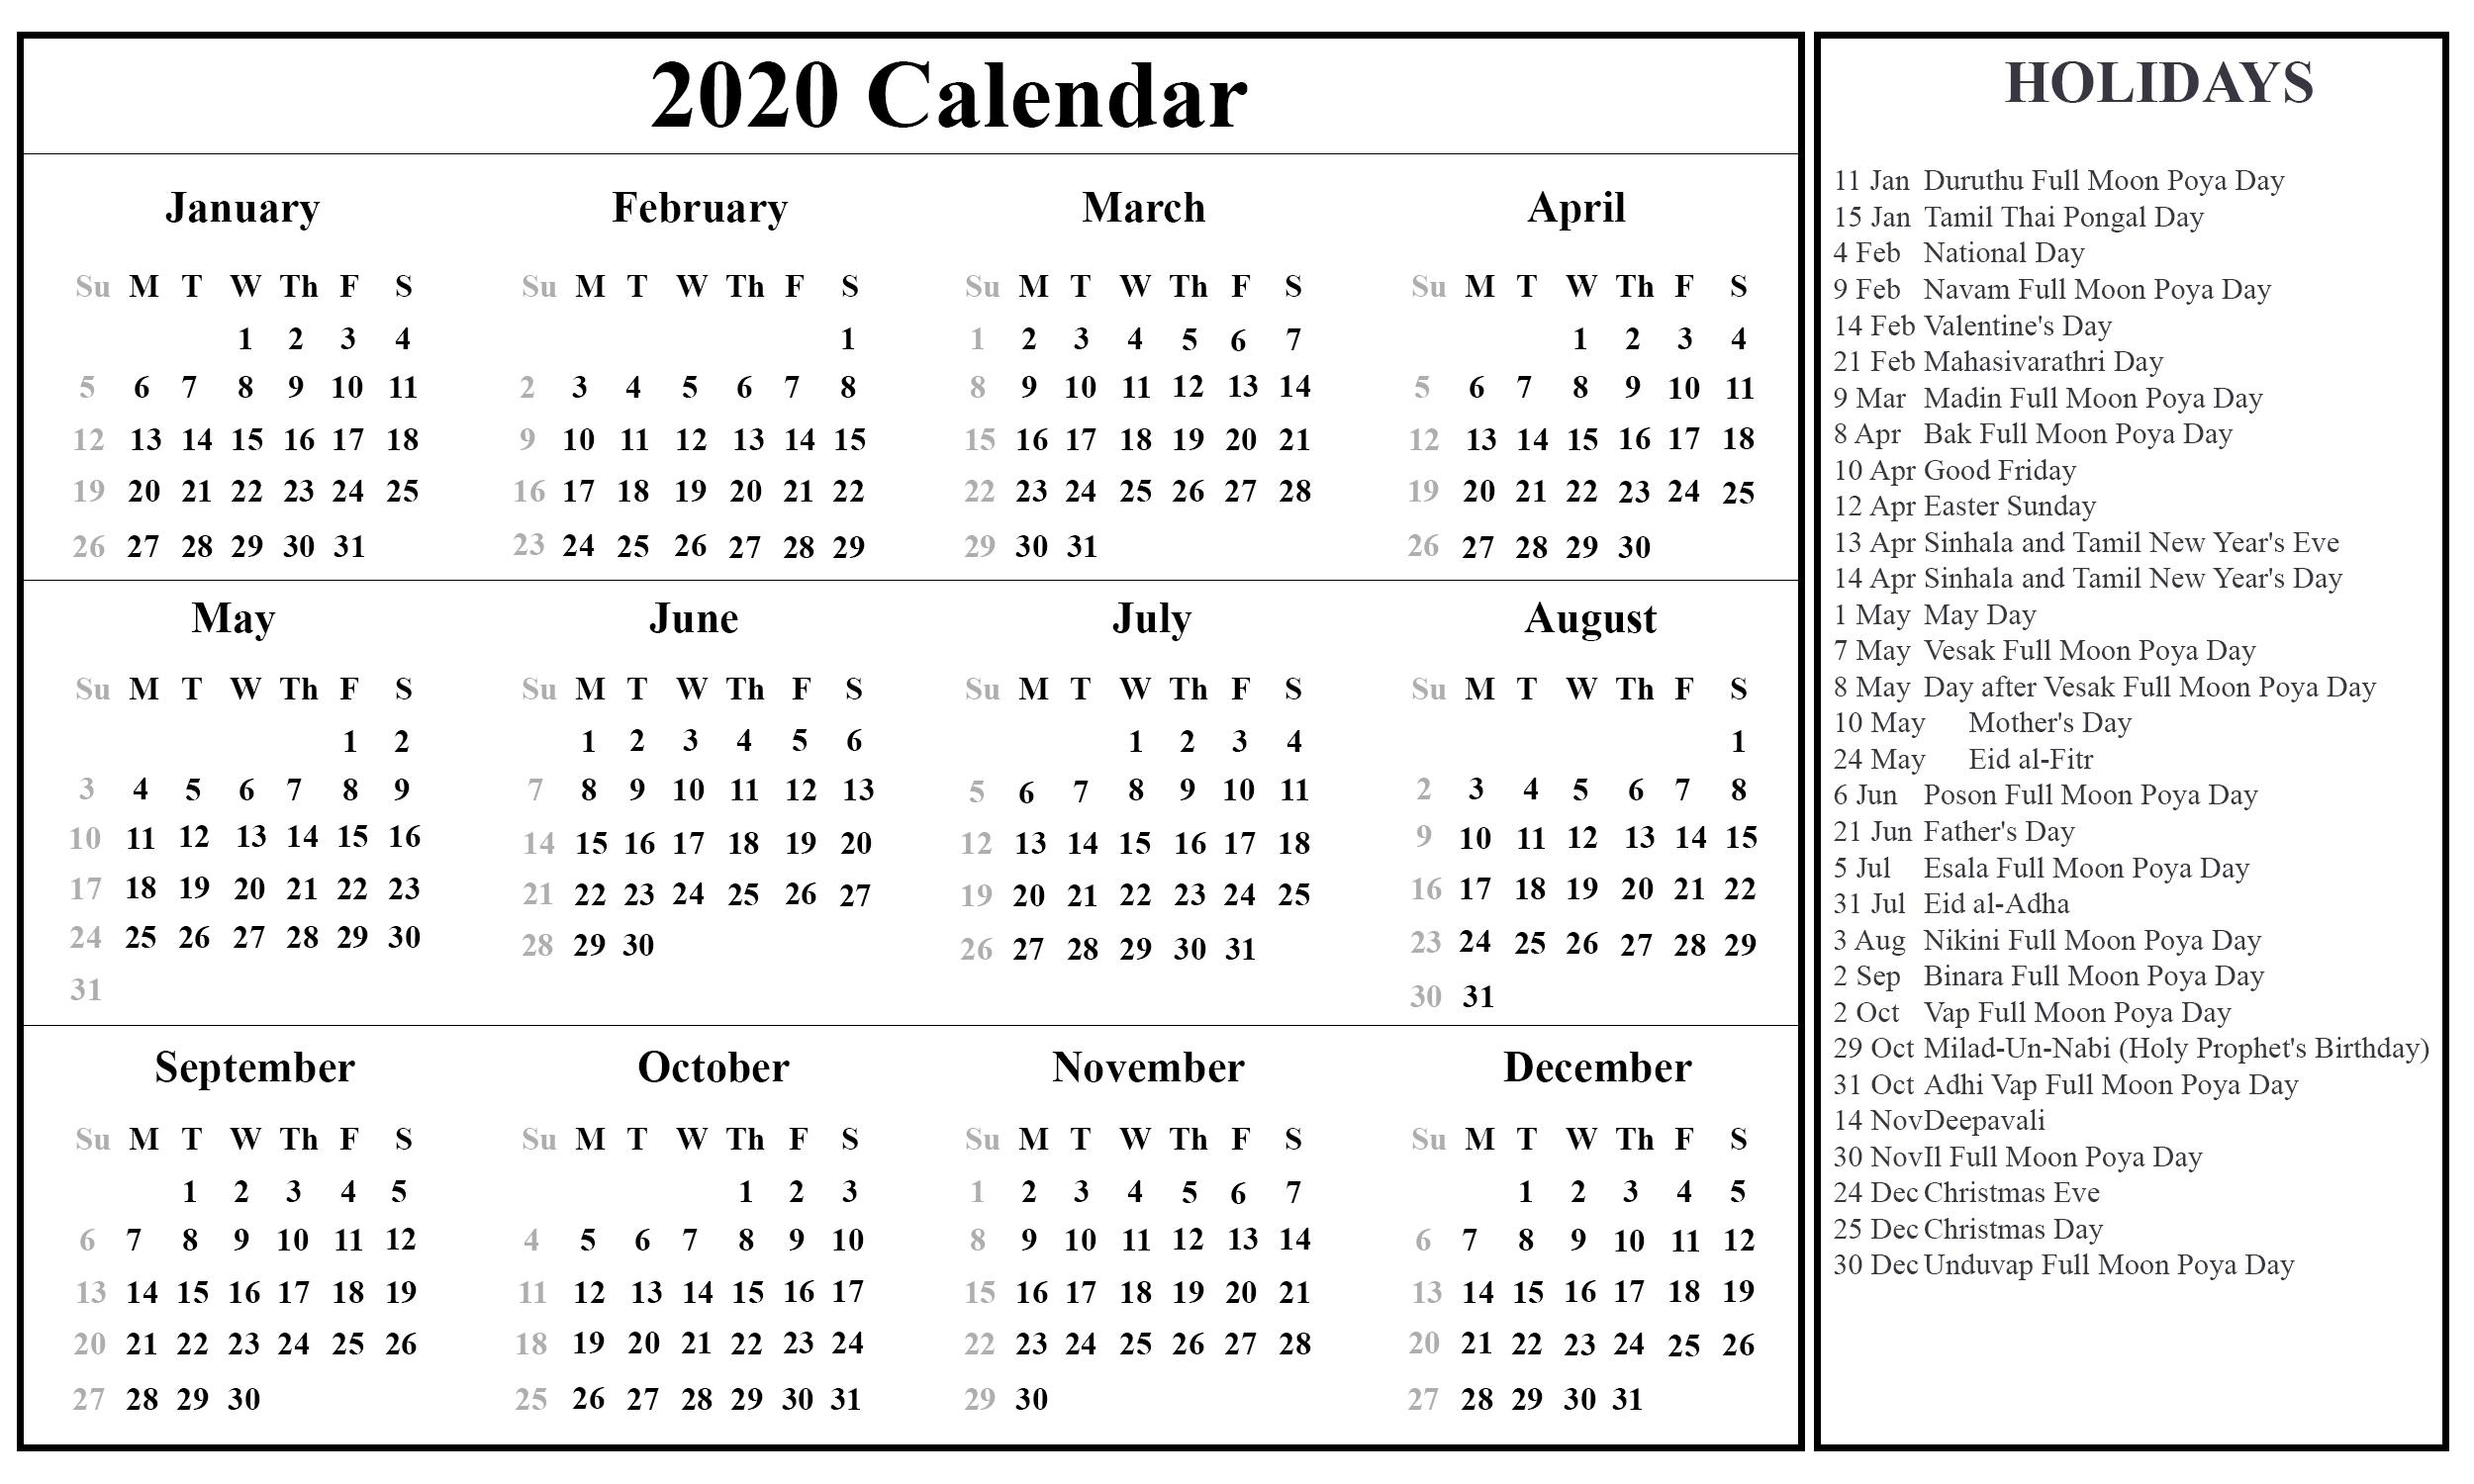 Free Printable Sri Lanka Calendar 2020 With Holidays In Pdf-January 2020 Islamic Calendar